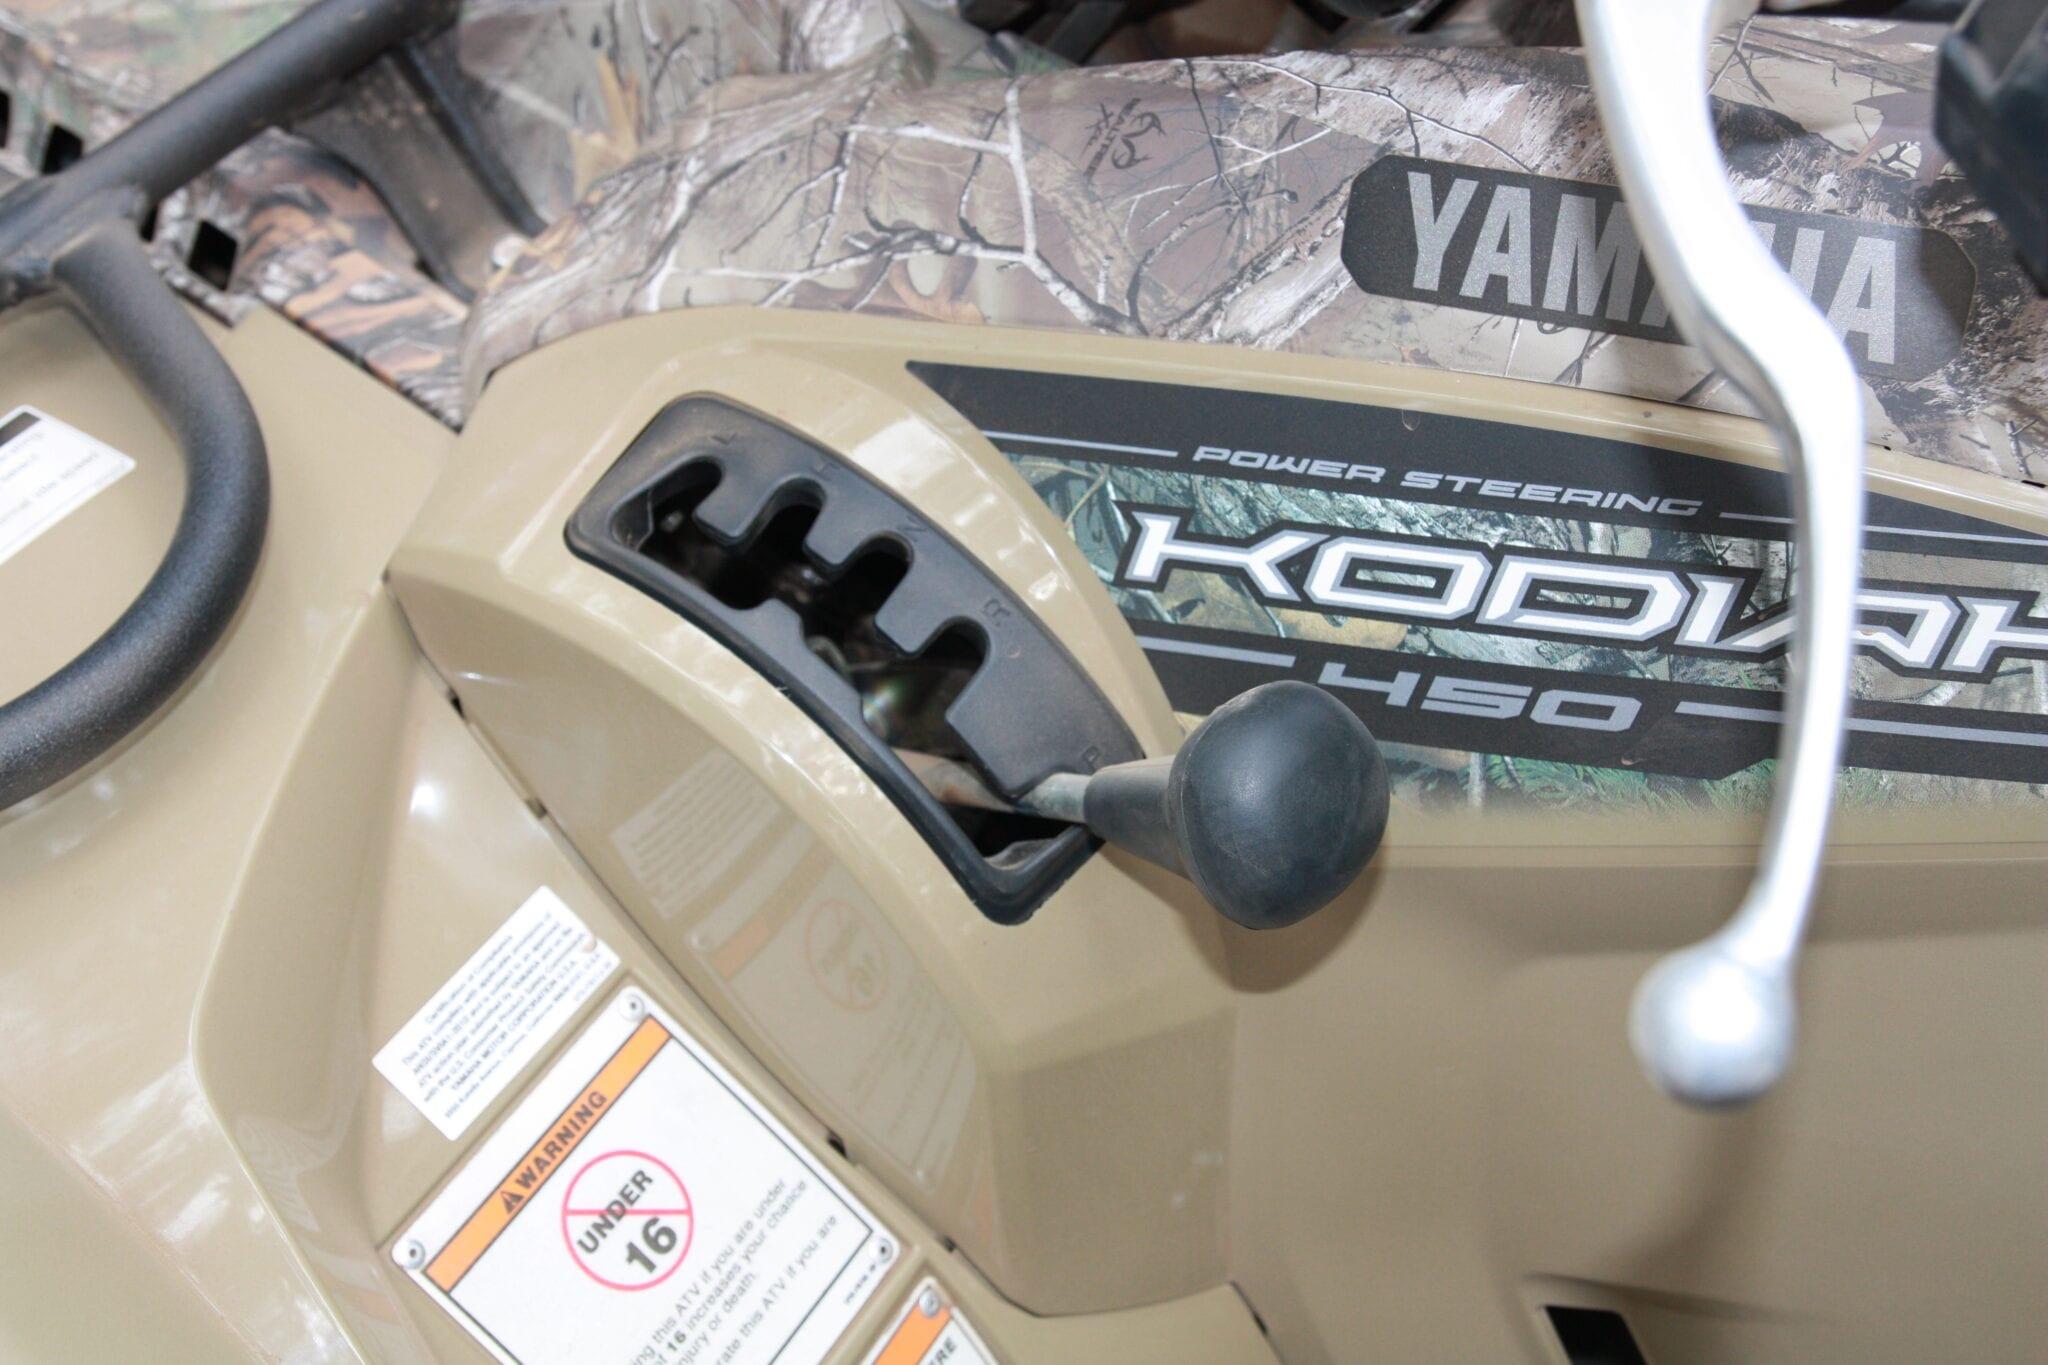 Electric Power Steering (EPS)